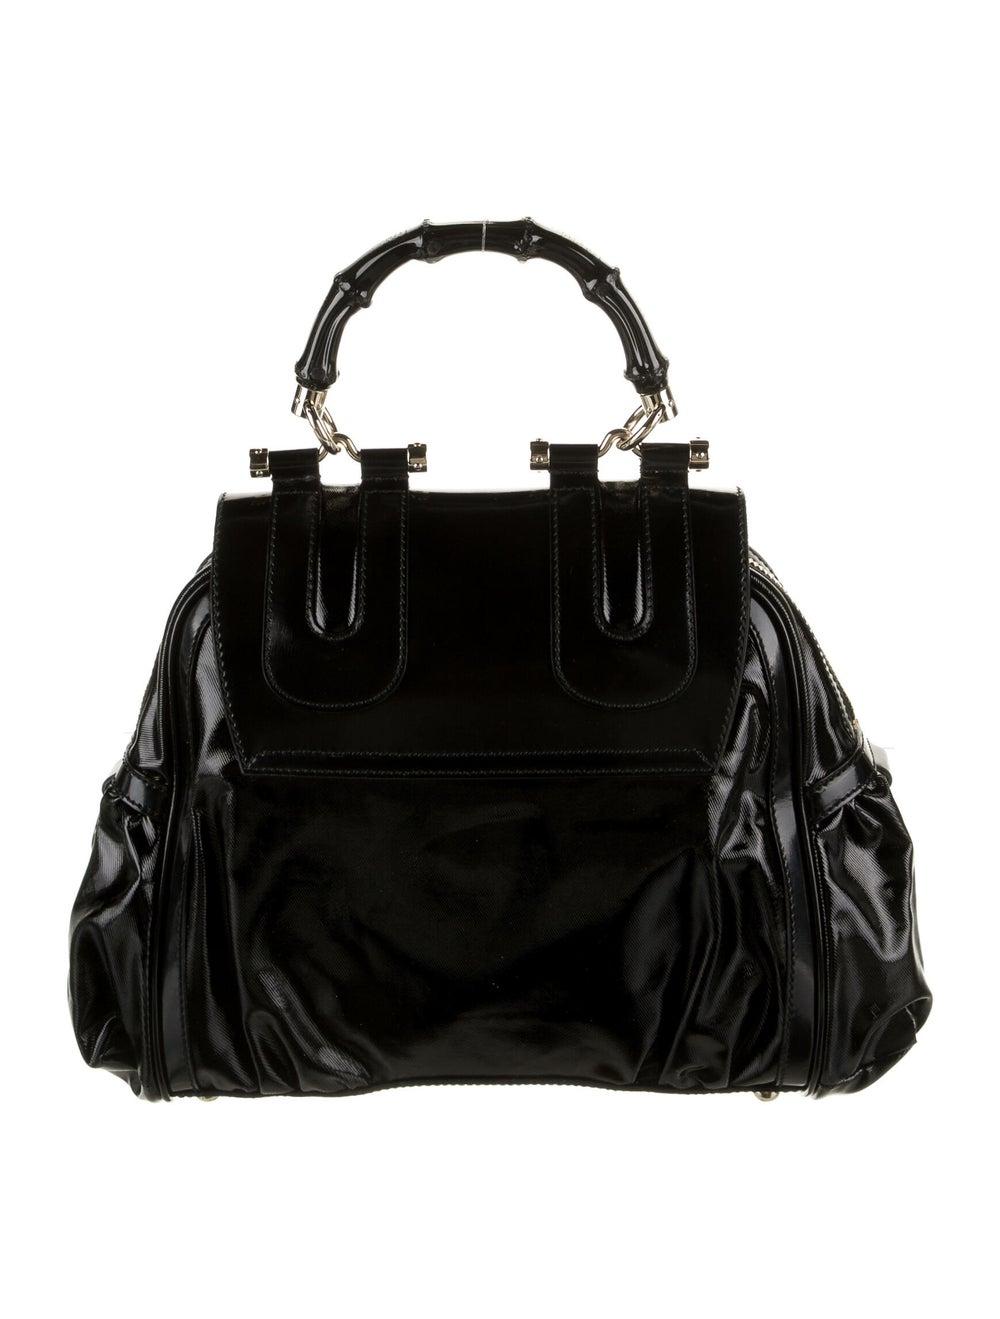 Gucci Pop Bamboo Handle Bag Black - image 4